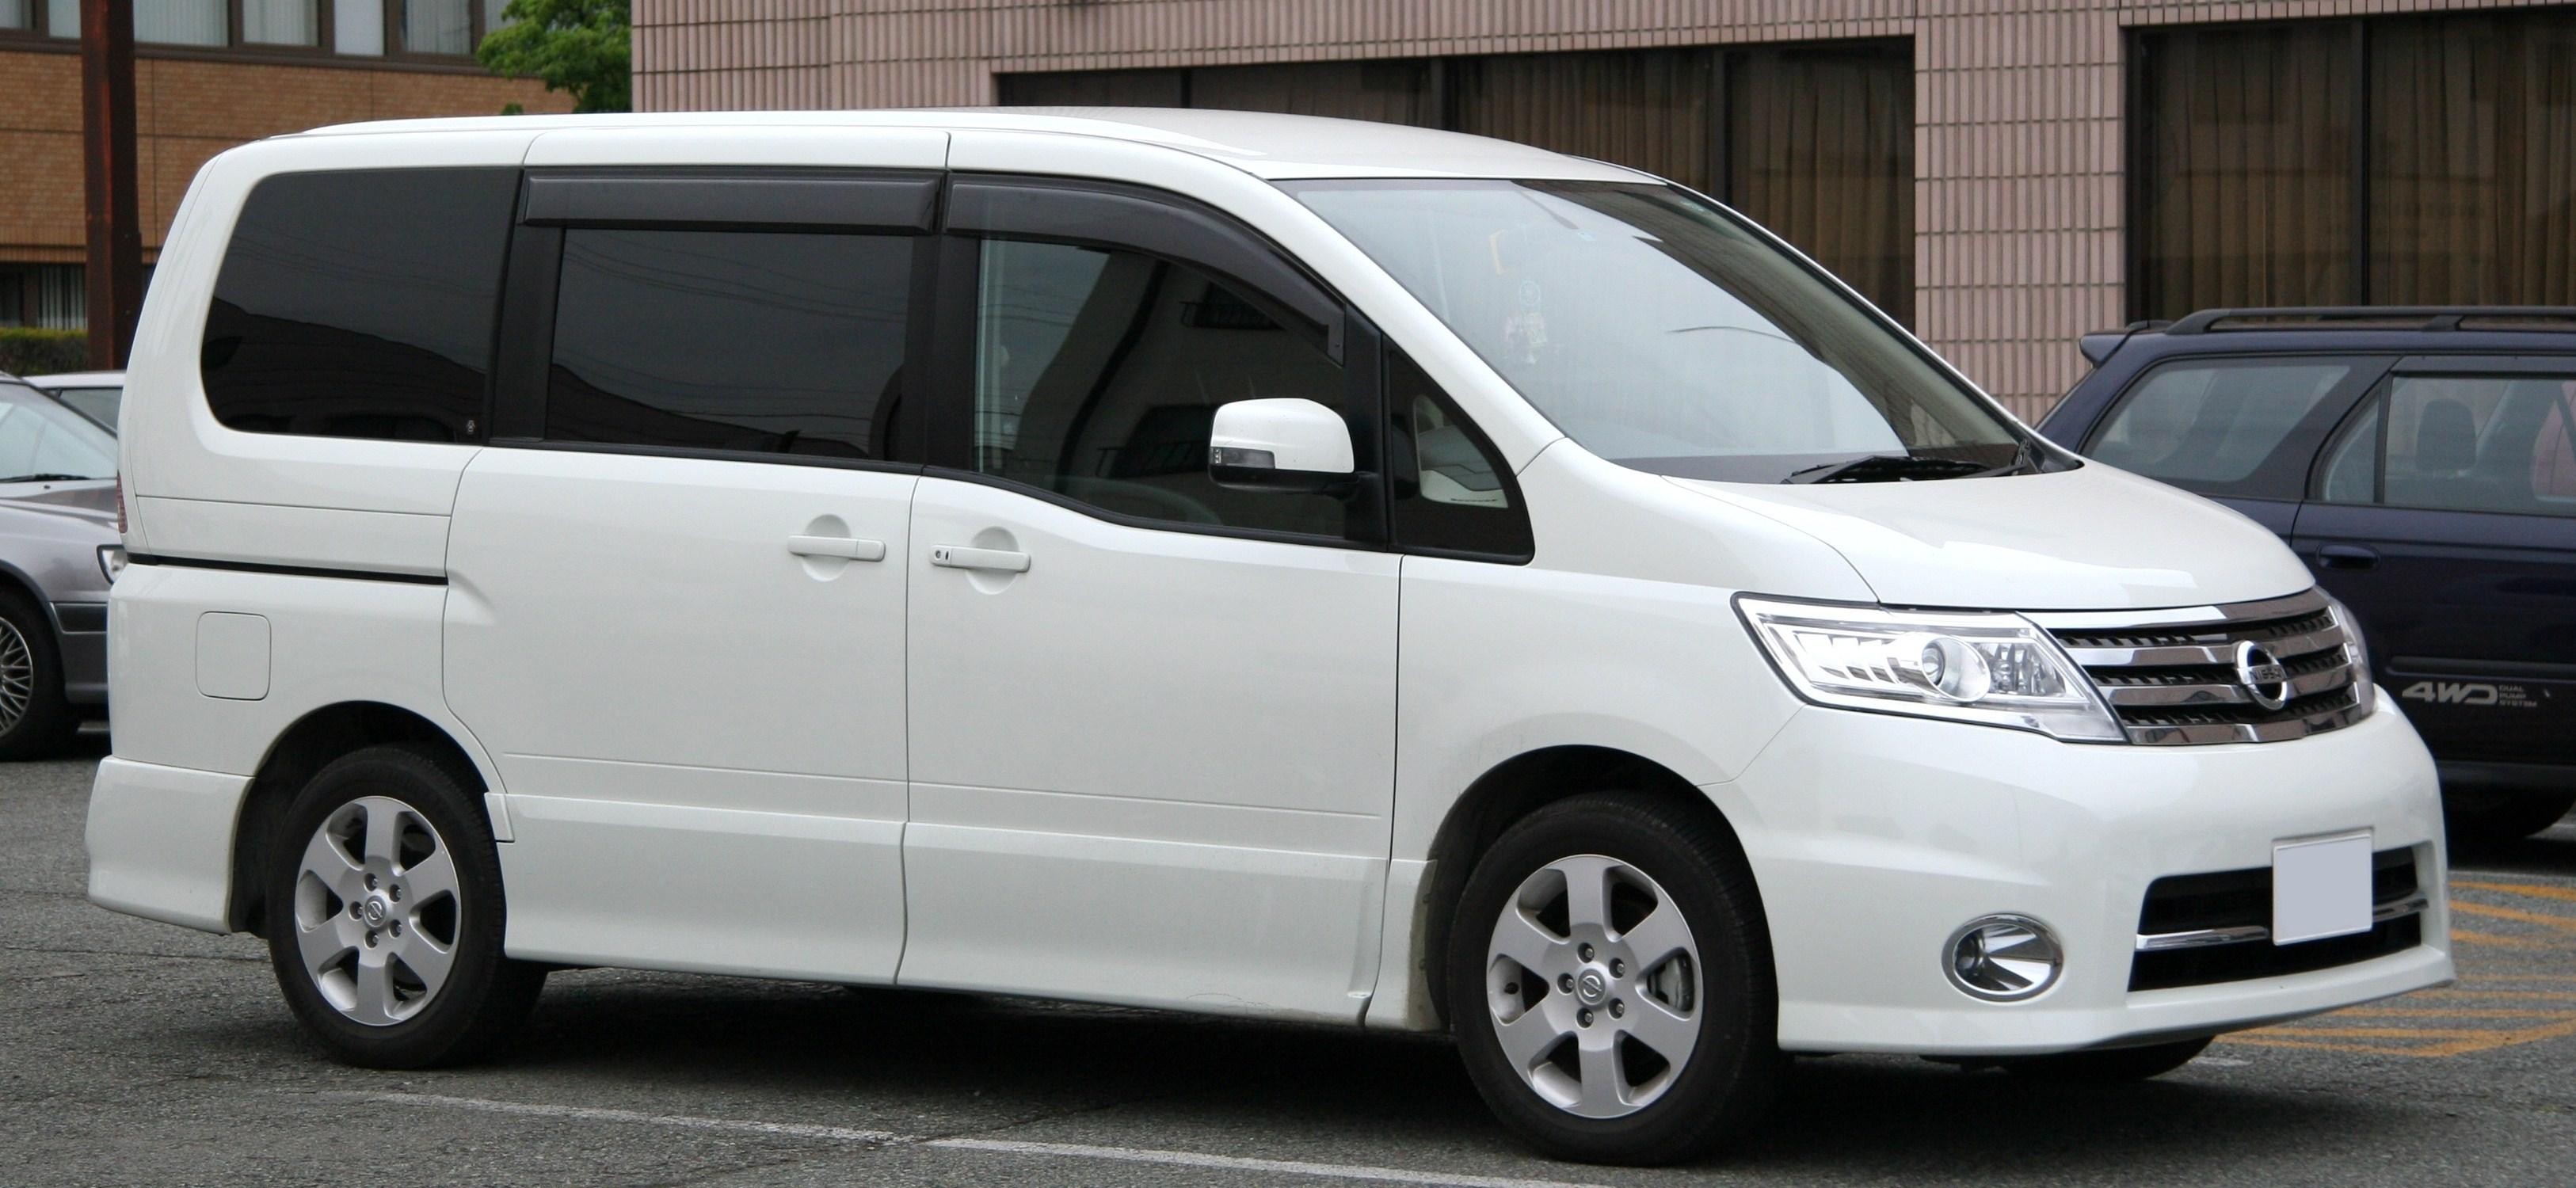 File Nissan Serena Jpg Wikimedia Commons